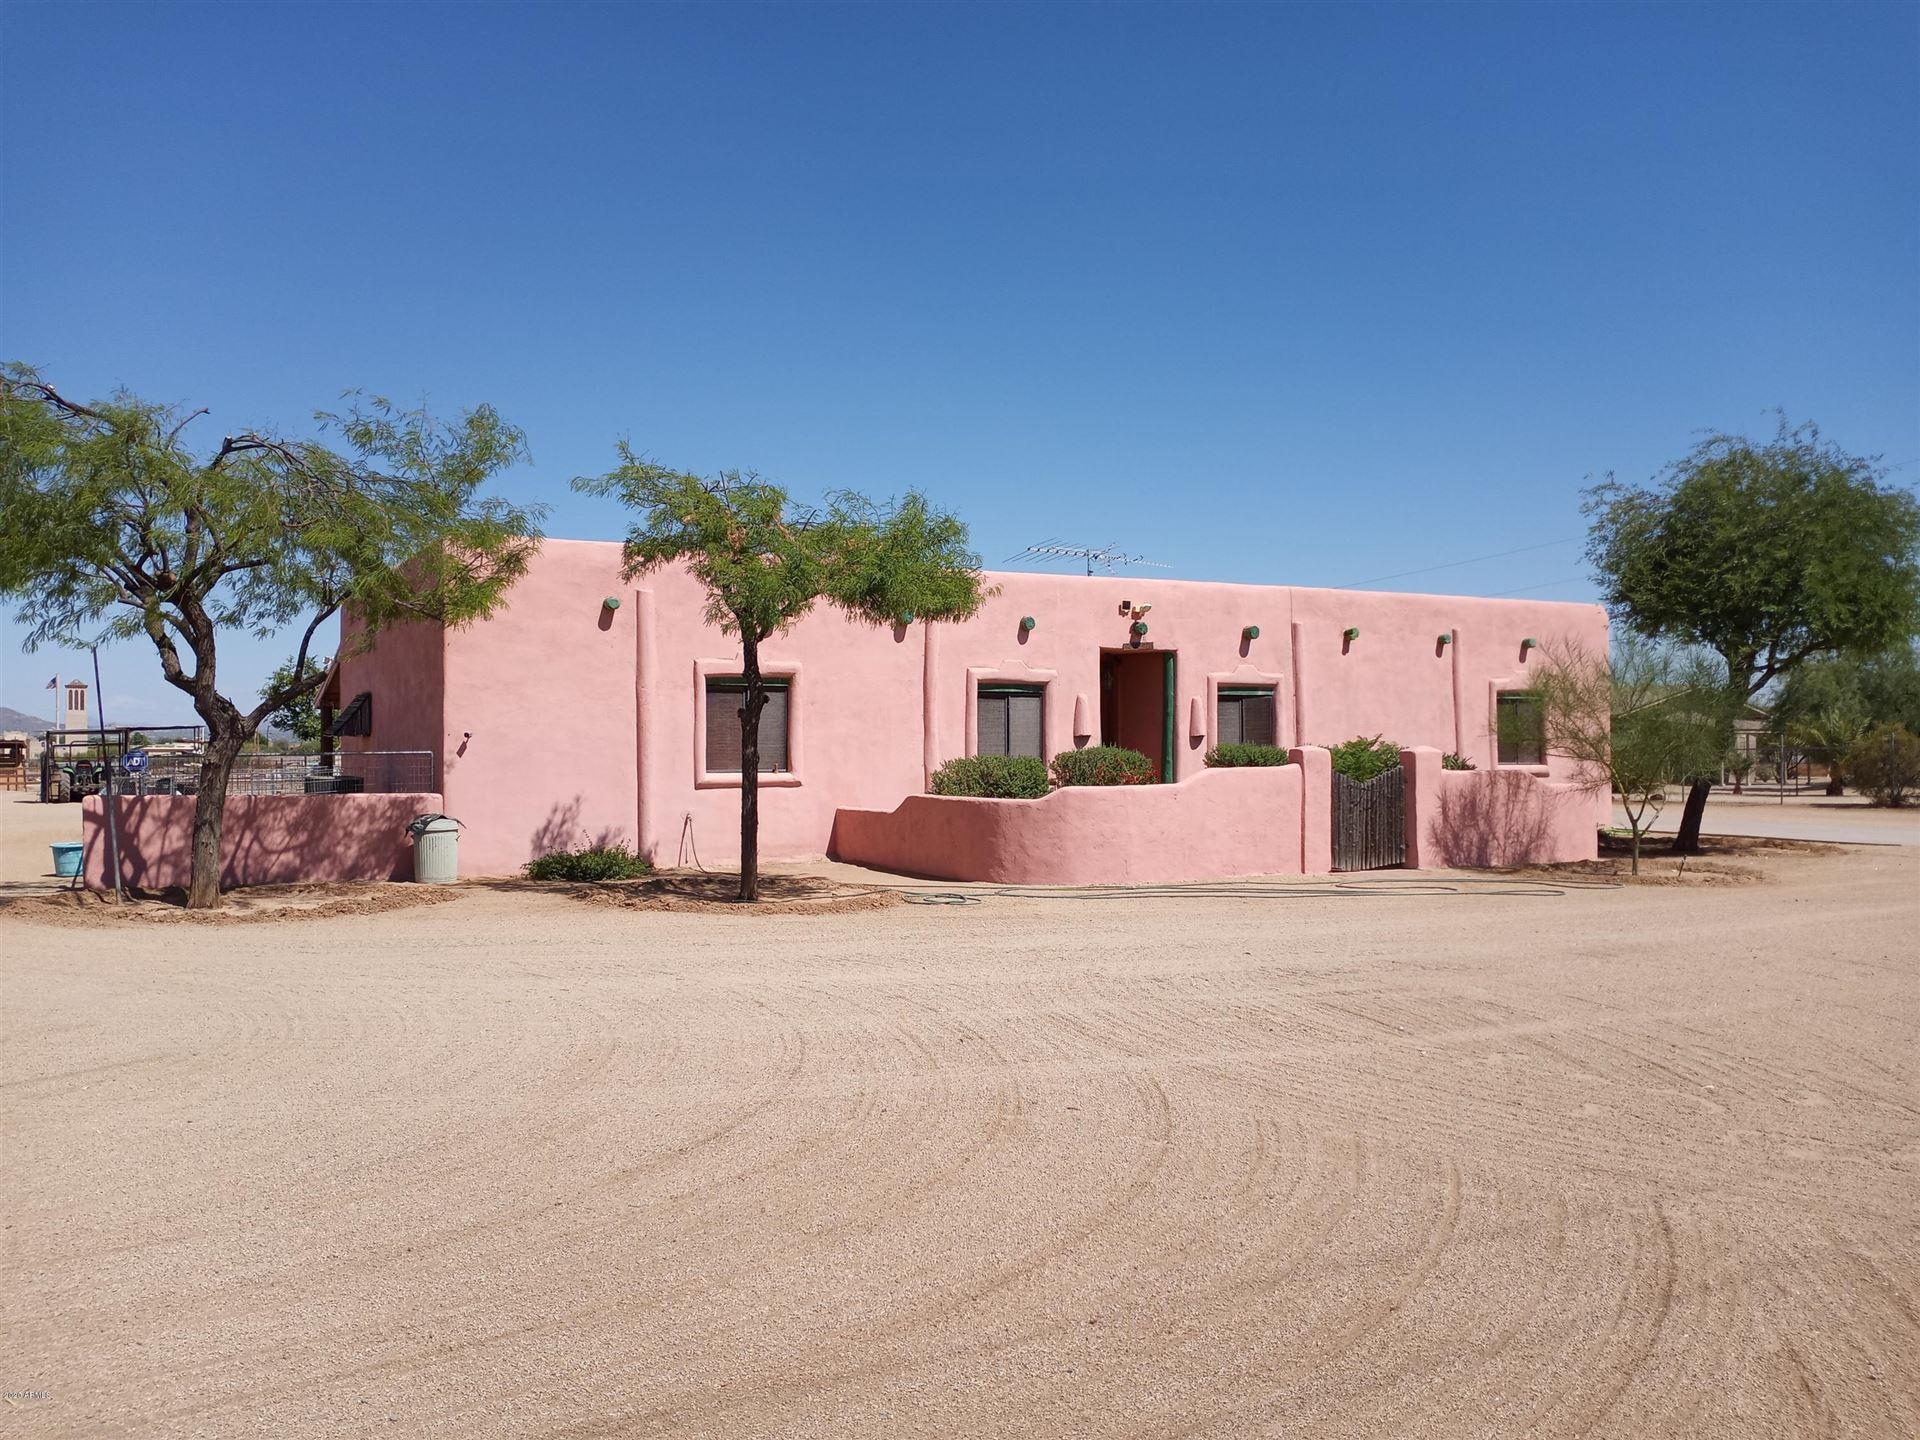 34841 N 3RD Street, Phoenix, AZ 85086 - MLS#: 6117981